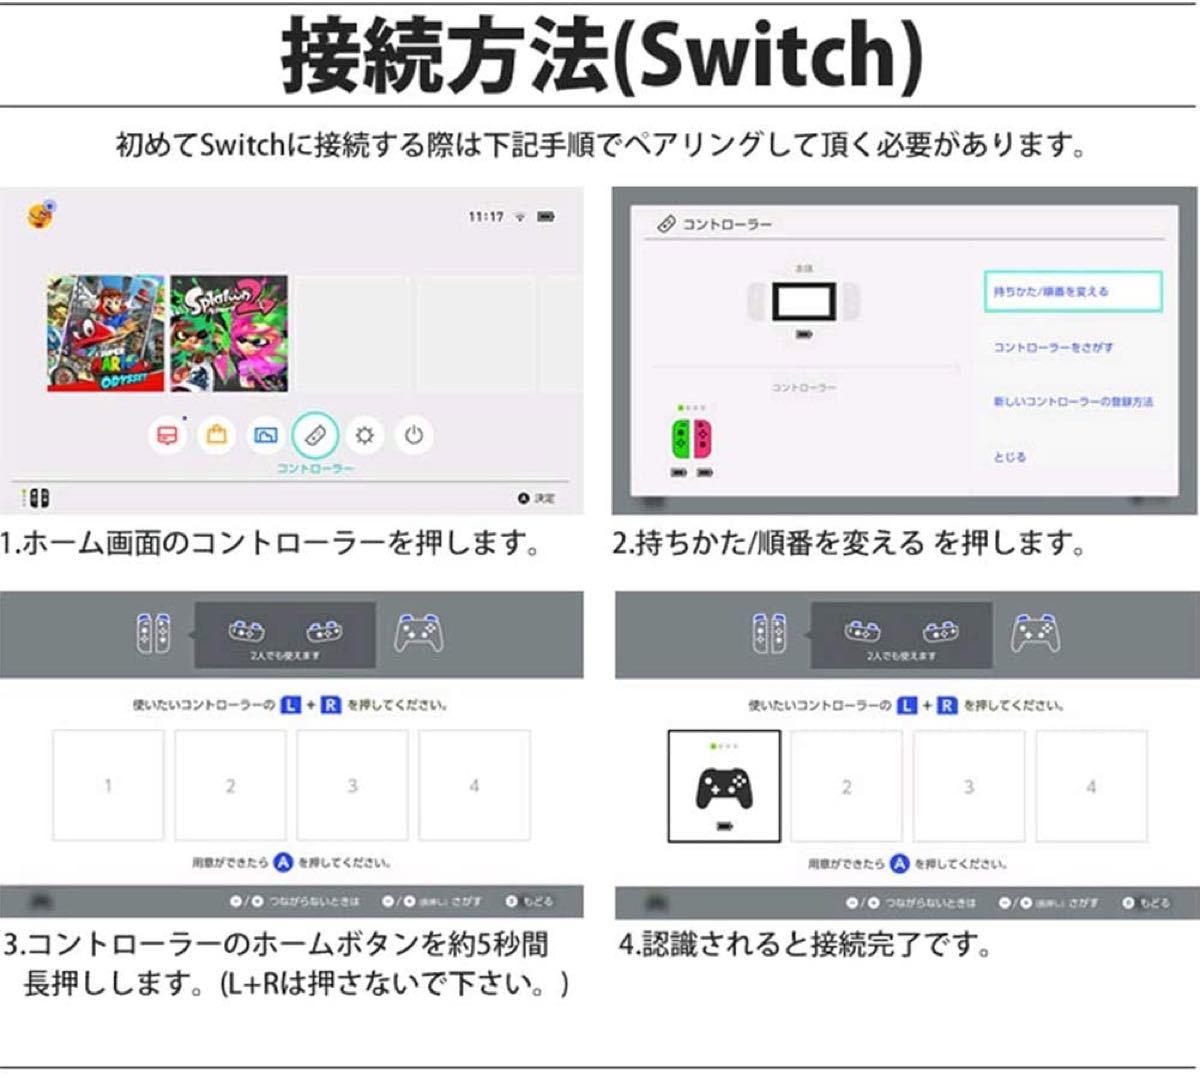 Switch コントローラー 無線 6軸 HD振動 TURBO連射機能付き